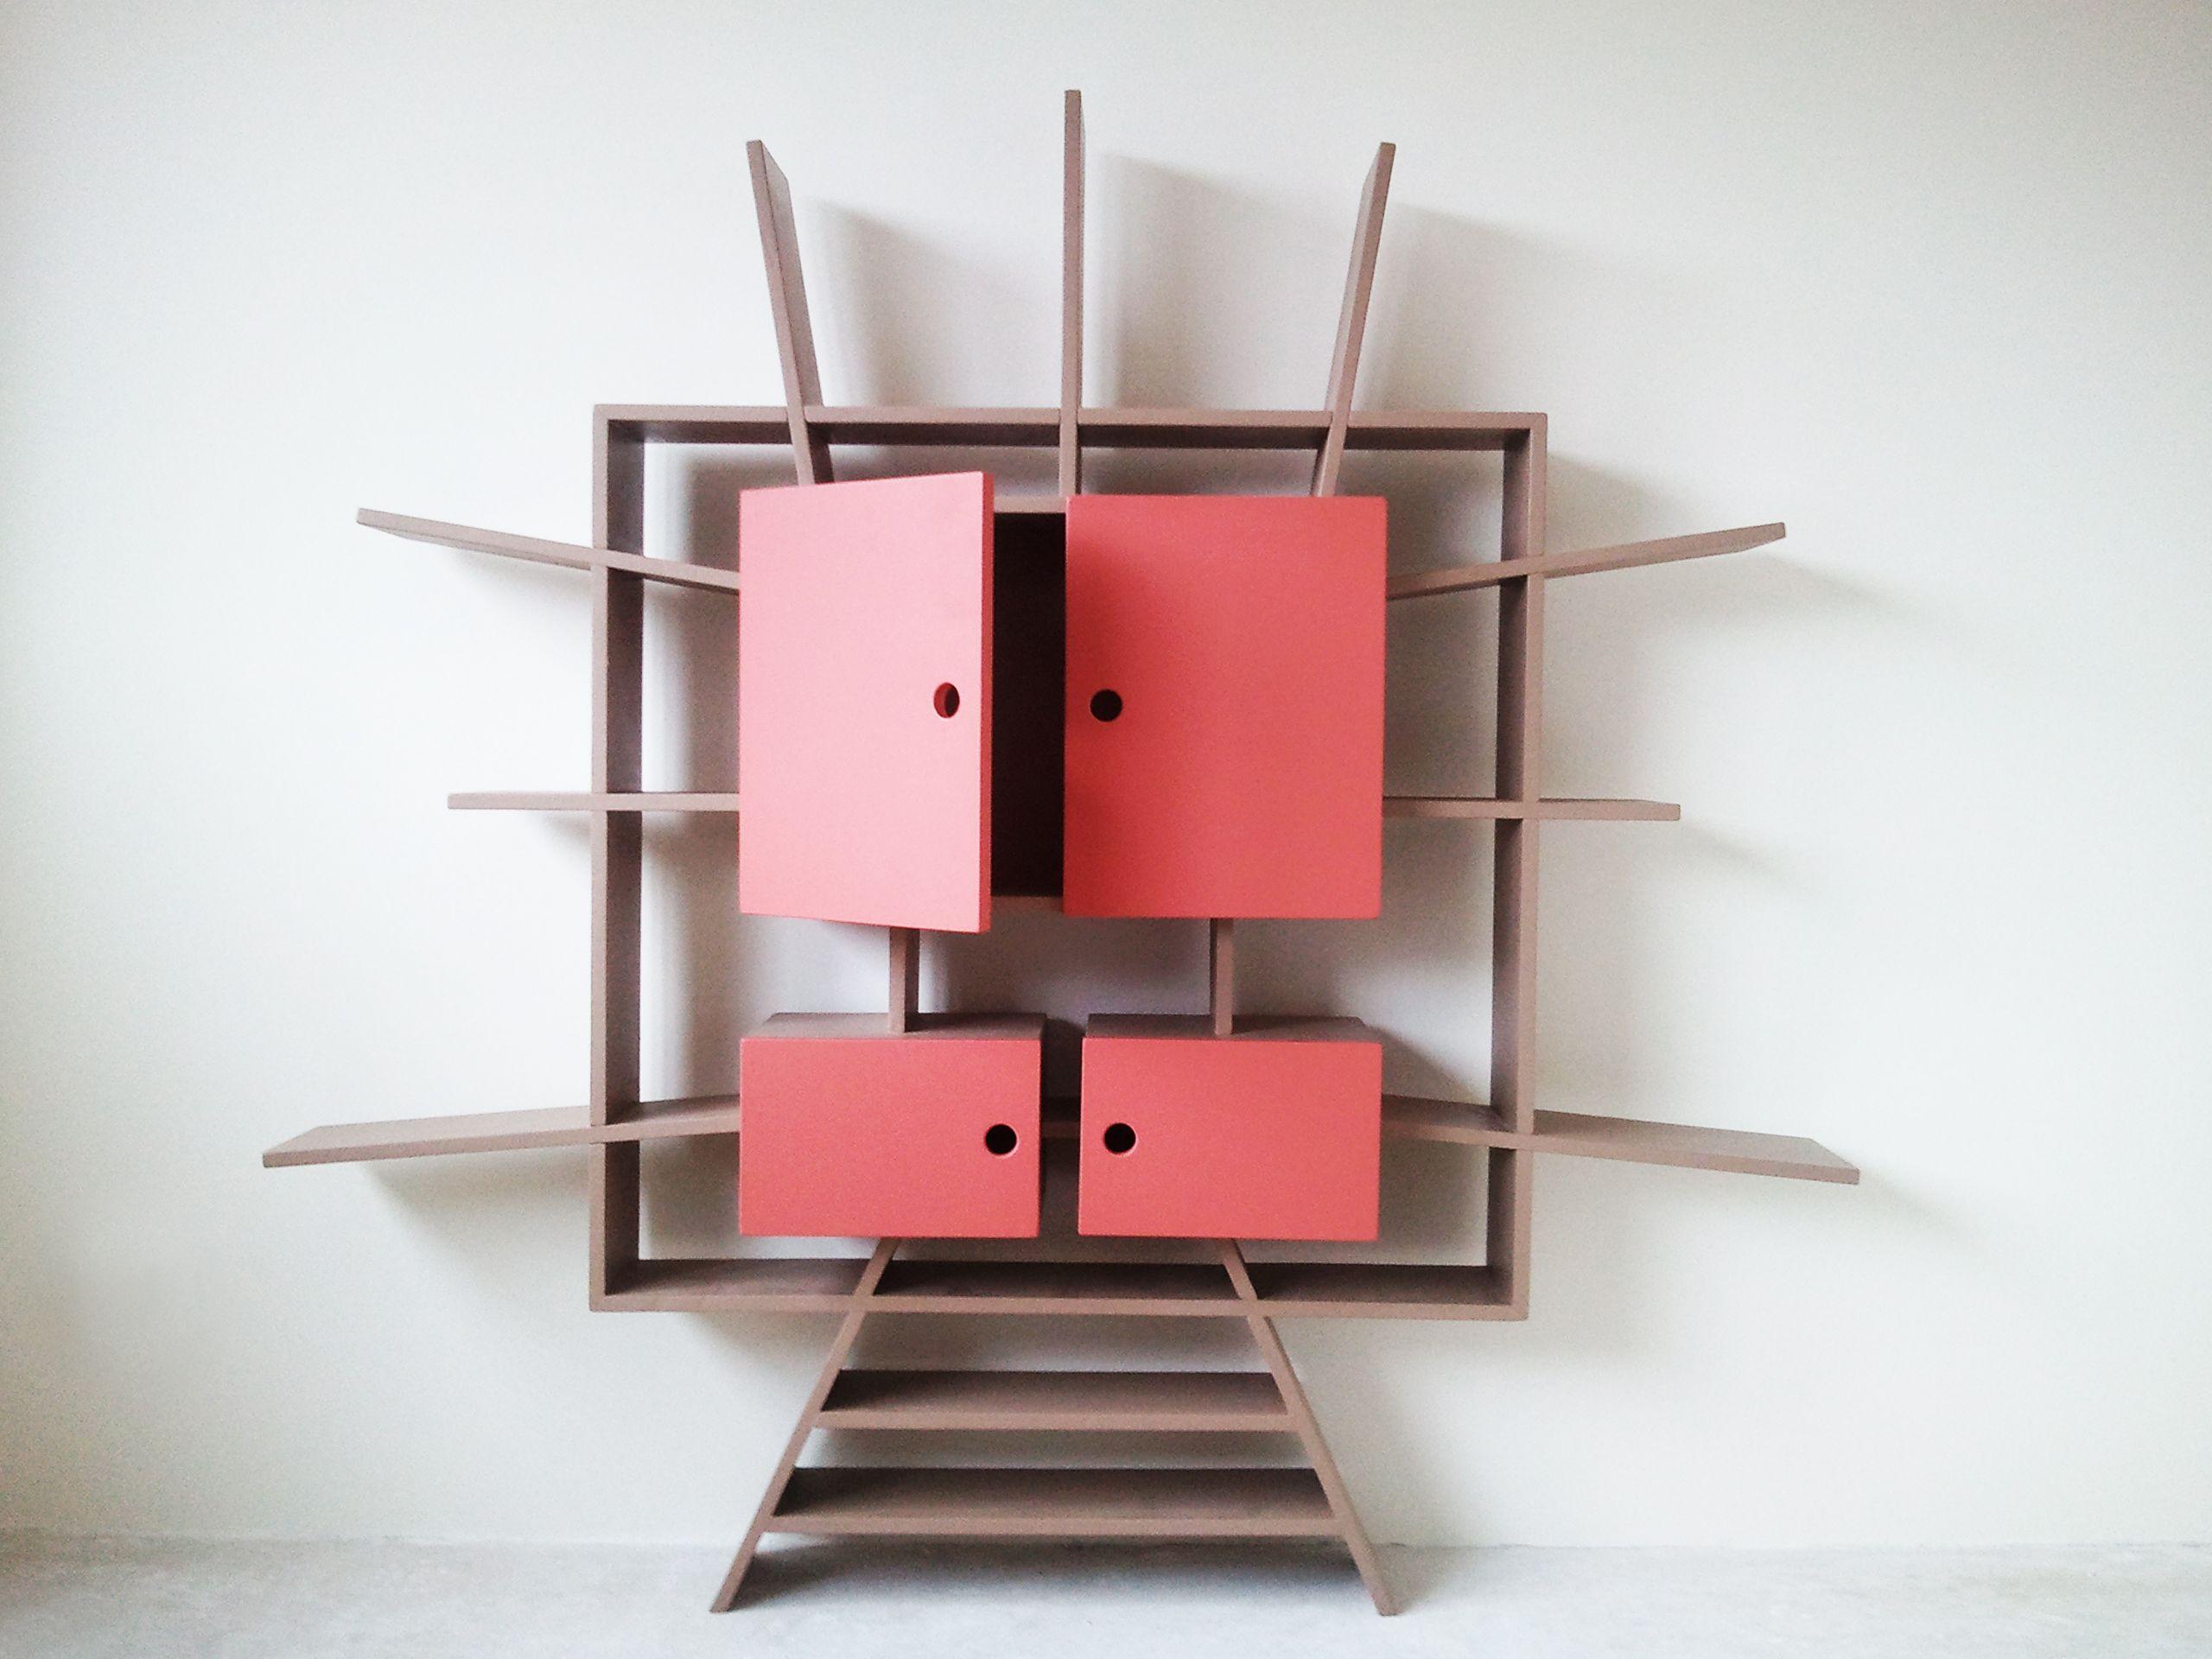 Tree Cupboard Via Stoerrr Stoerrr Design Design Dutch Design Home Decor